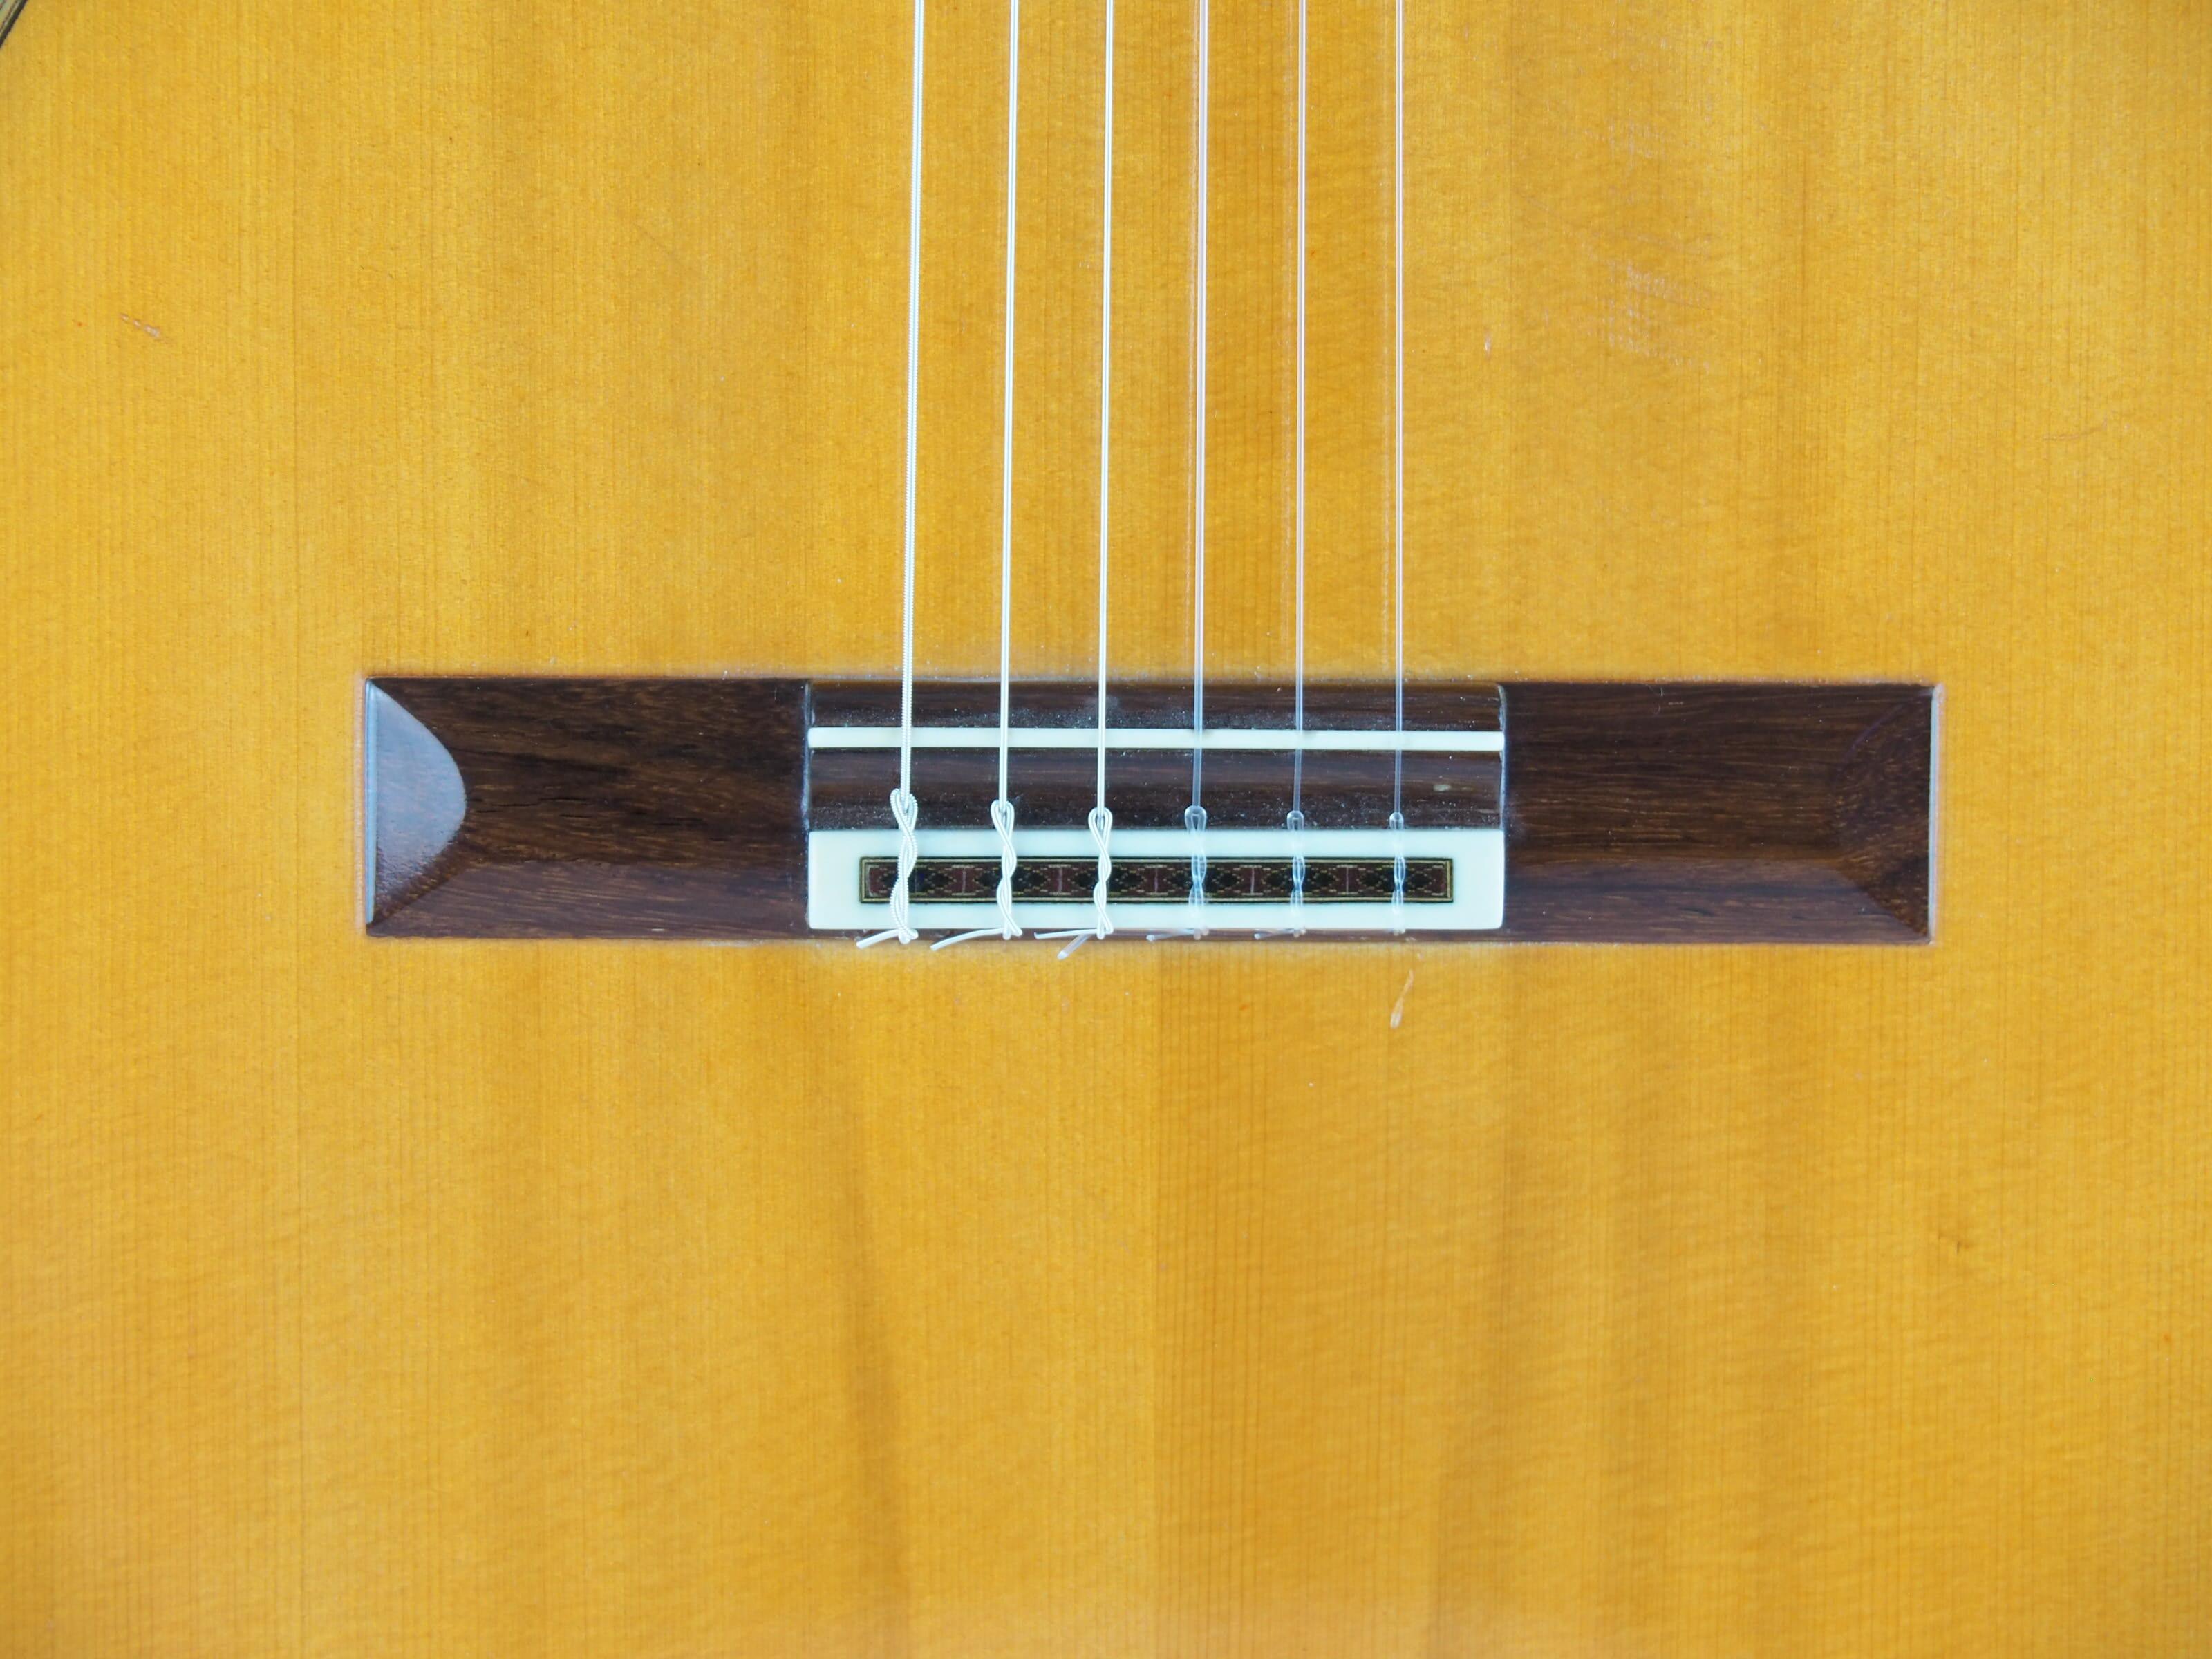 Daniel Friederich luthier guitare classique No 19FRI354-06